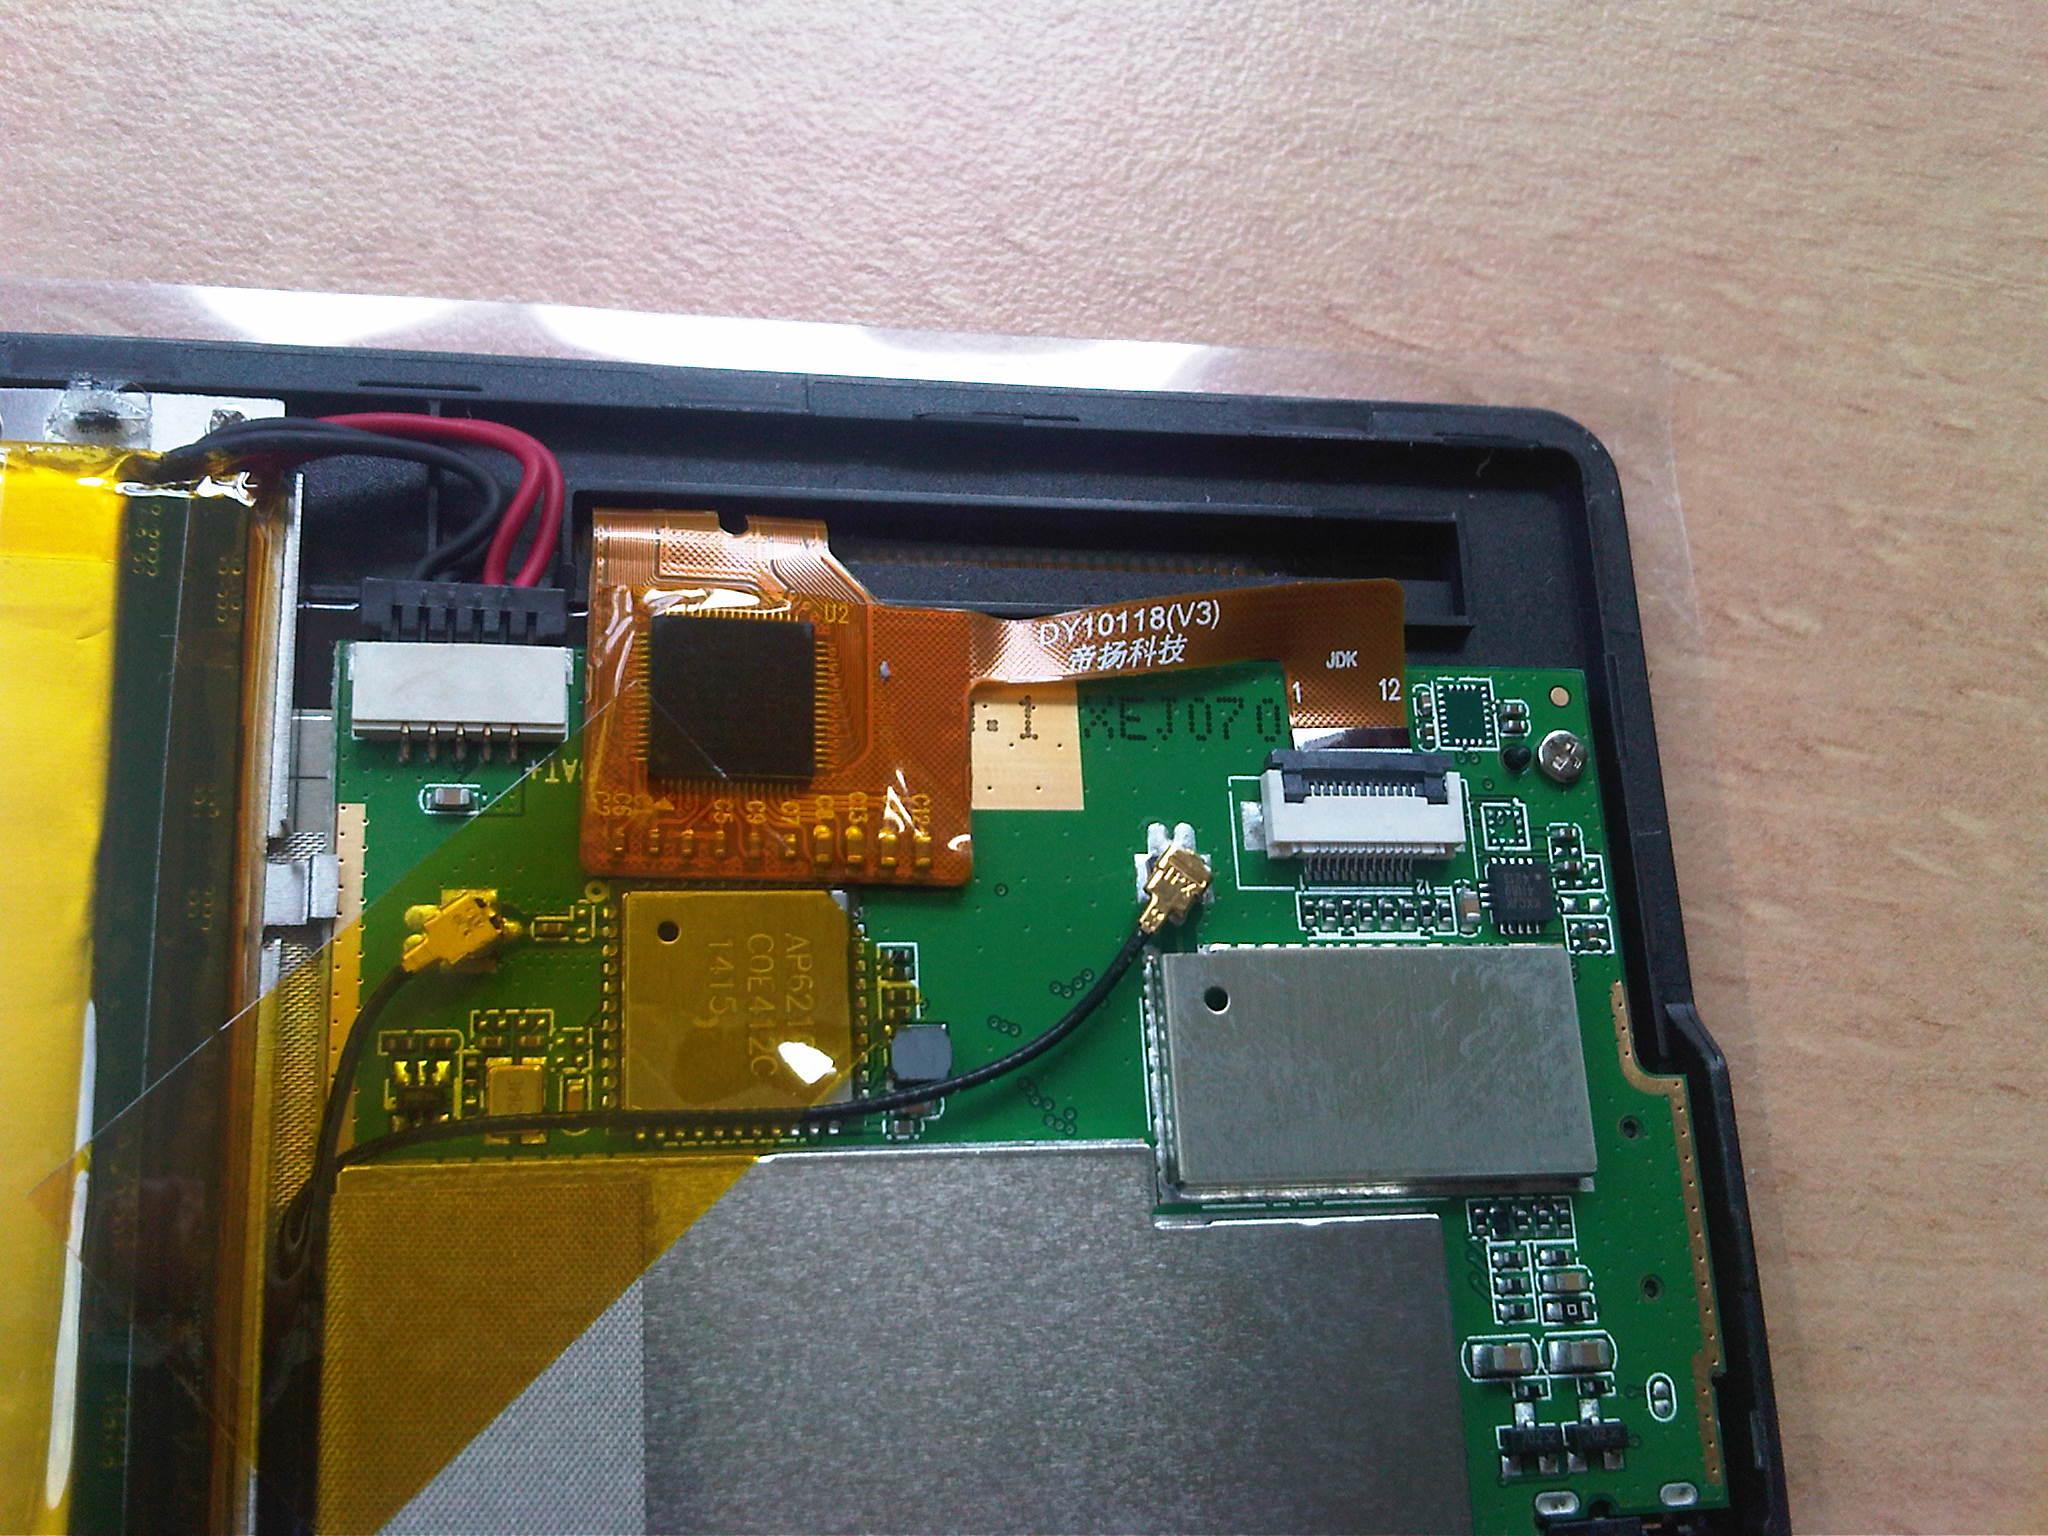 Beliebt Tablet mit Strom versorgen über Akku-Anschloss - Mikrocontroller.net BN52